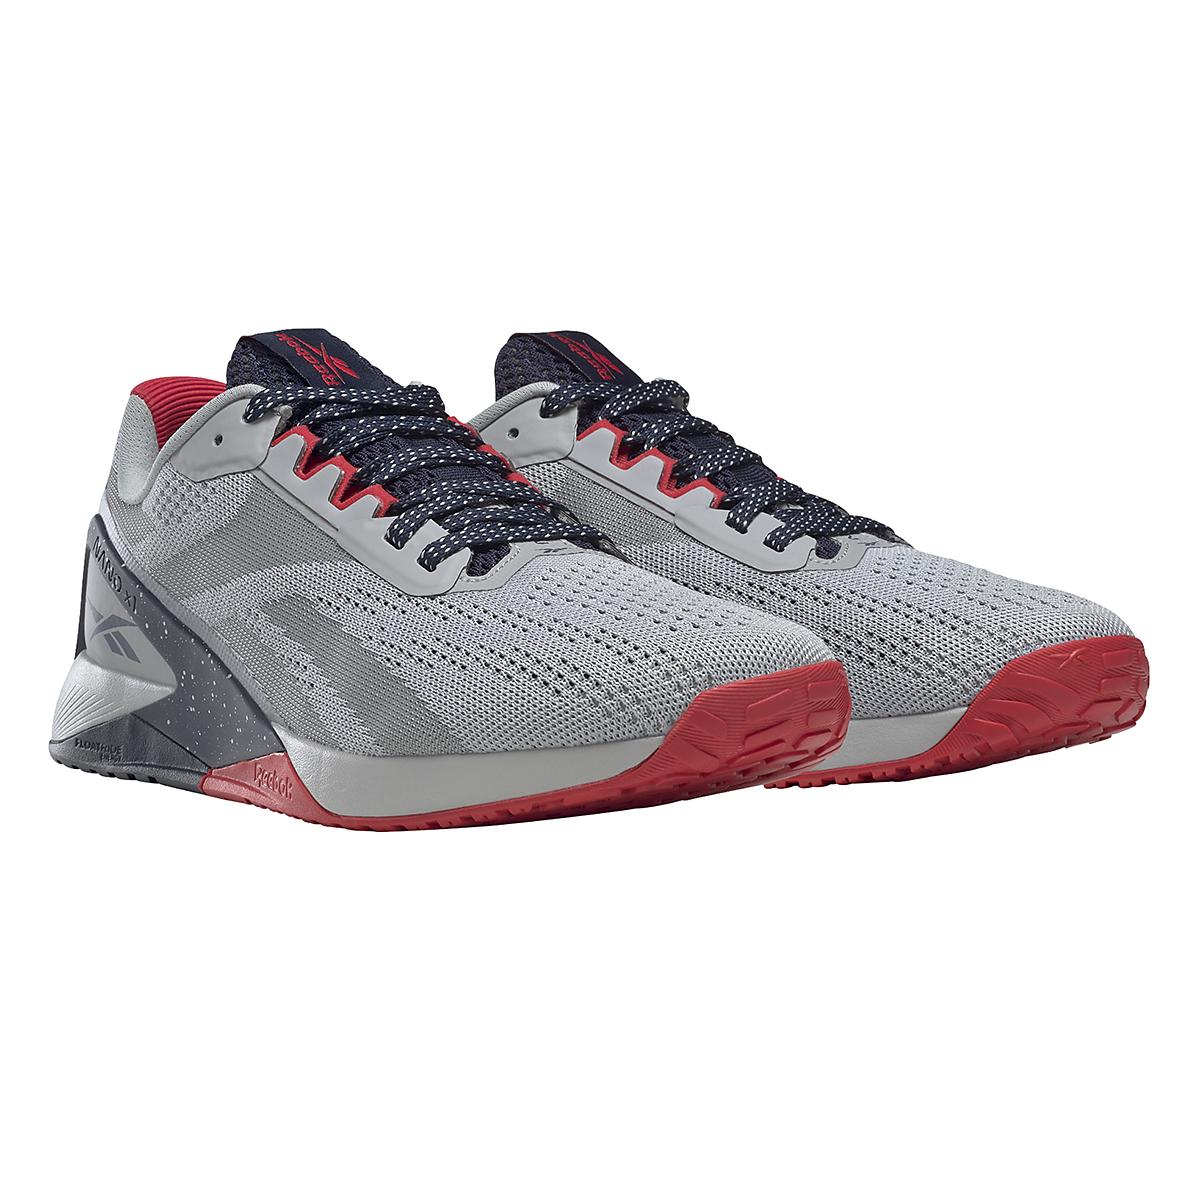 Men's Reebok Nano X1 Training Shoe - Color: Pure Grey/Vector Navy/Vector Red - JackRabbit Exclusive - Size: 8 - Width: Regular, Pure Grey/Vector Navy/Vector Red - JackRabbit Exclusive, large, image 7